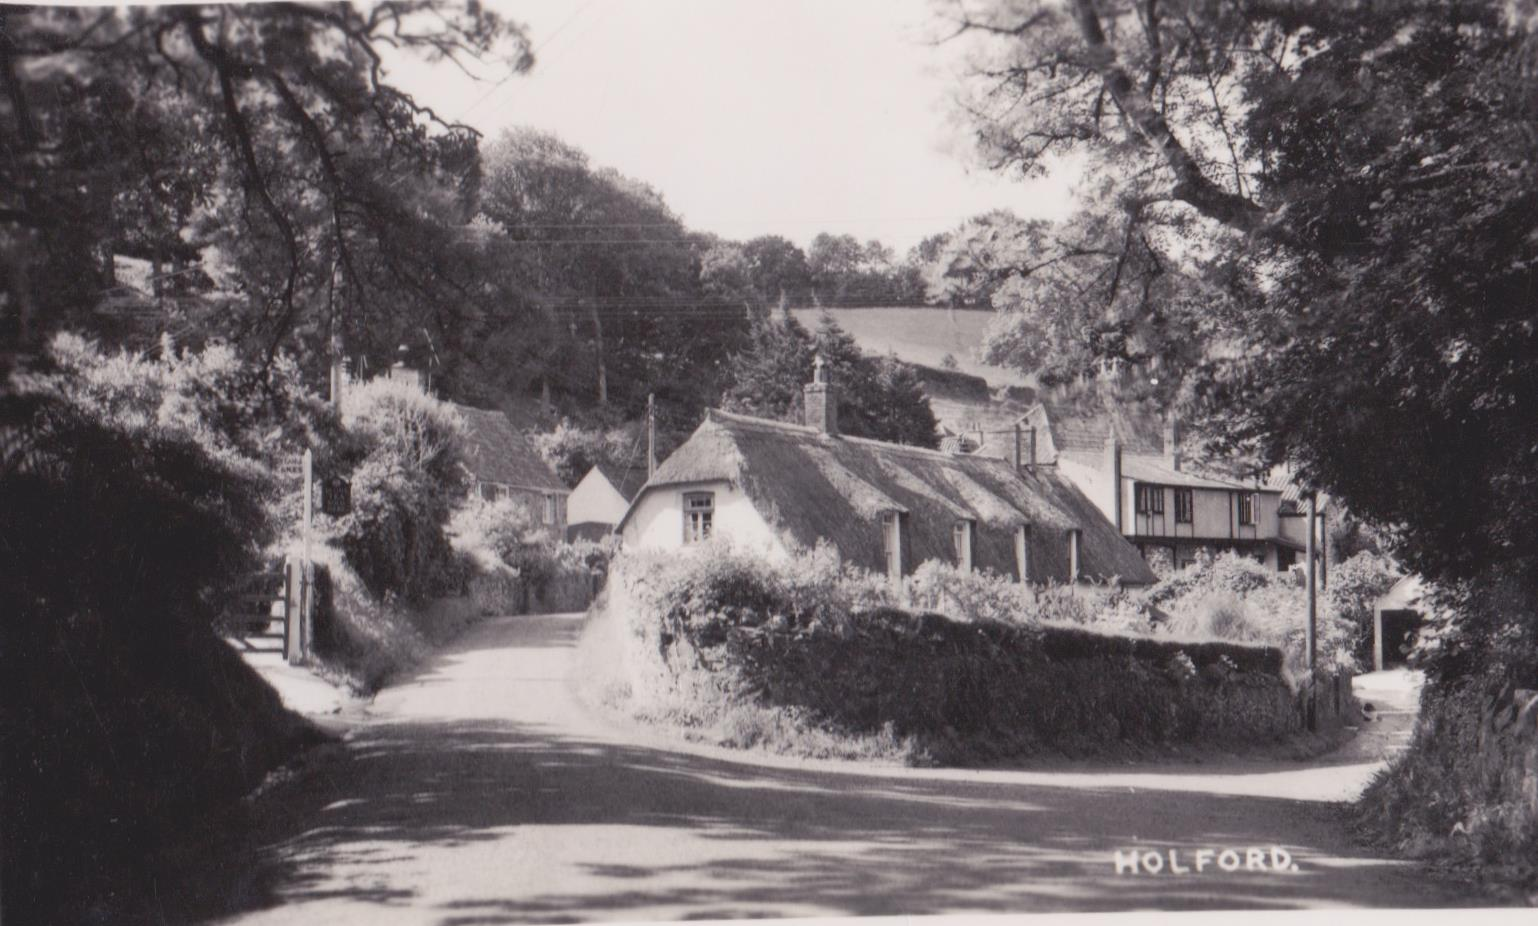 Bygone - Holford